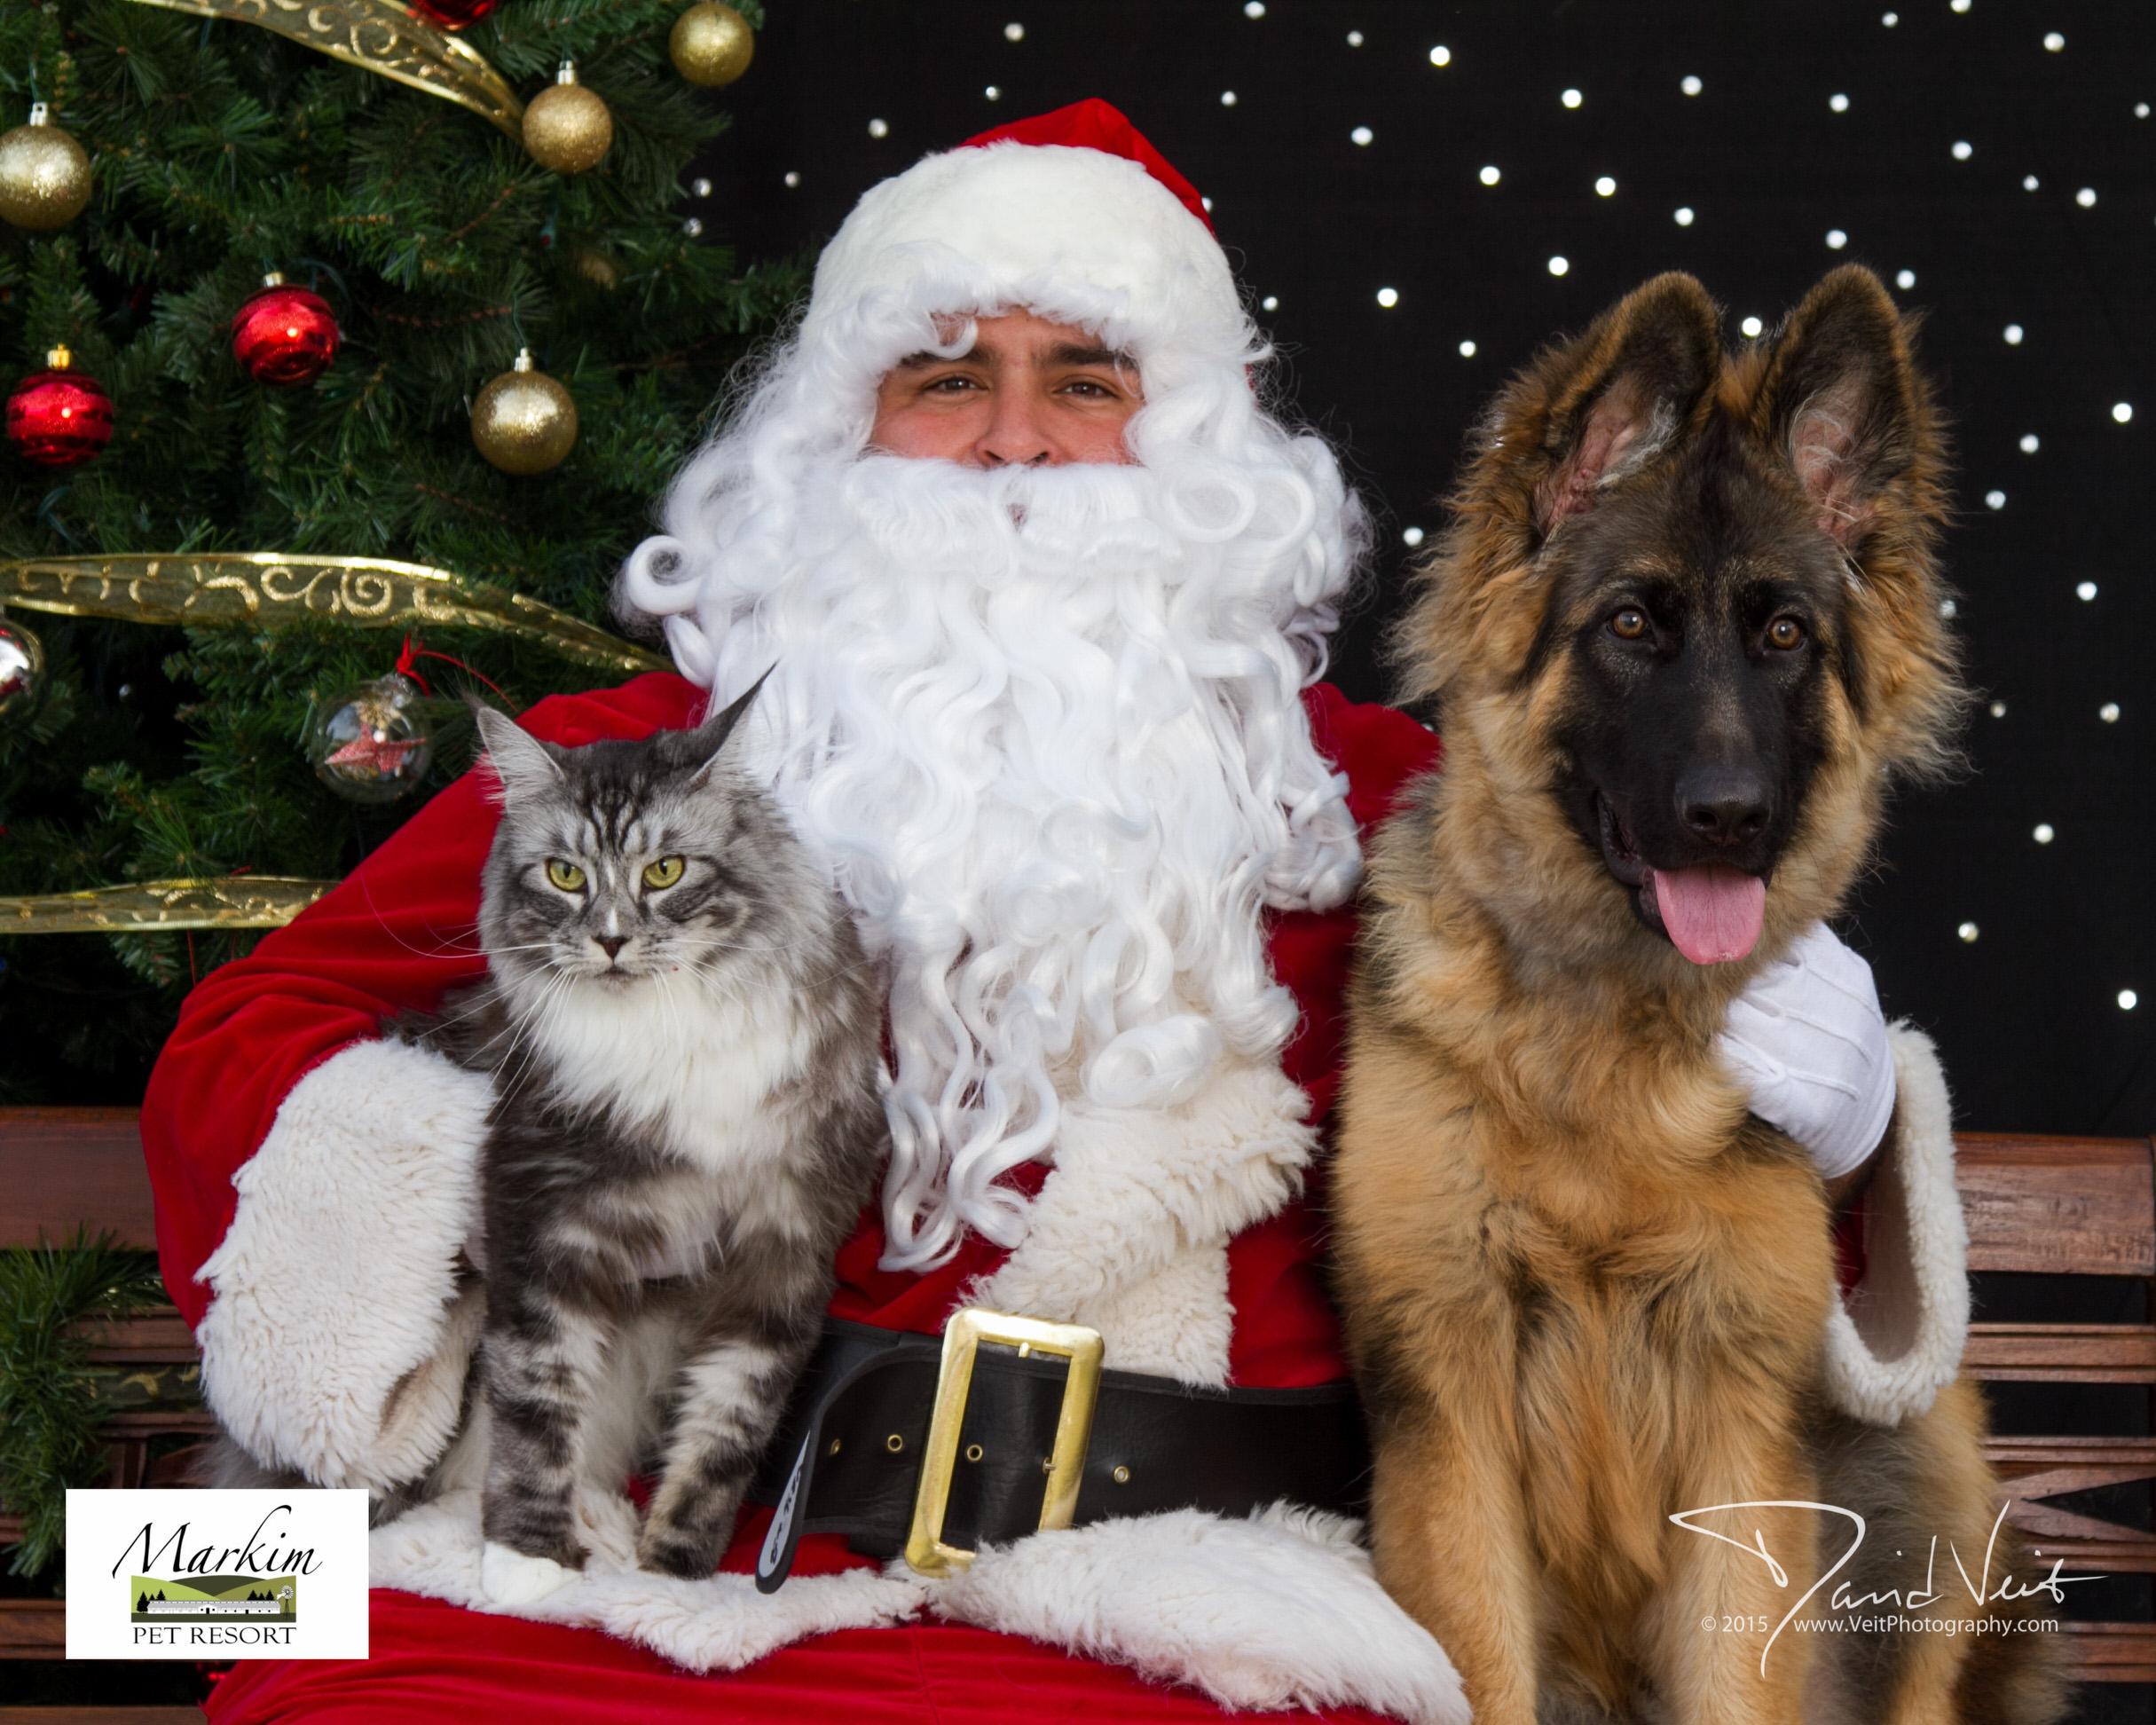 German Shepherd Puppy and Cat with Santa.jpg